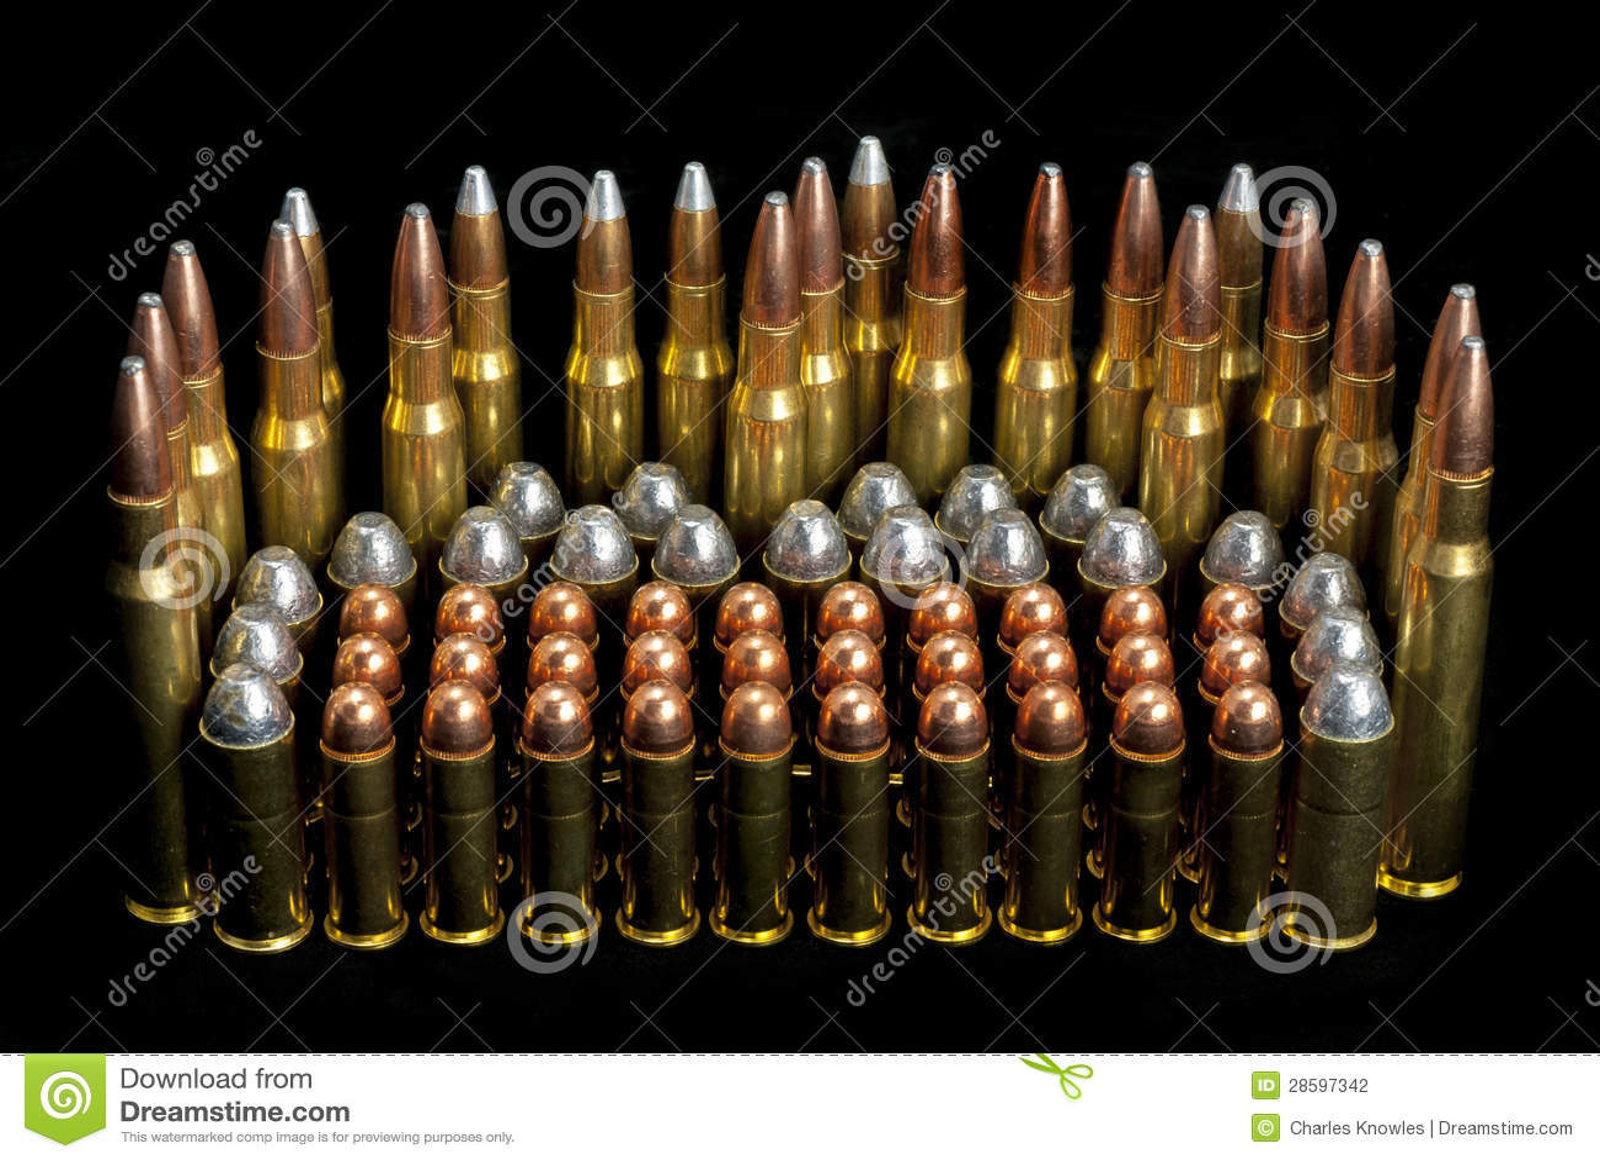 Gun Ammunition Bullets Different Sizes Stock Photography ...  Ammunition Sizes